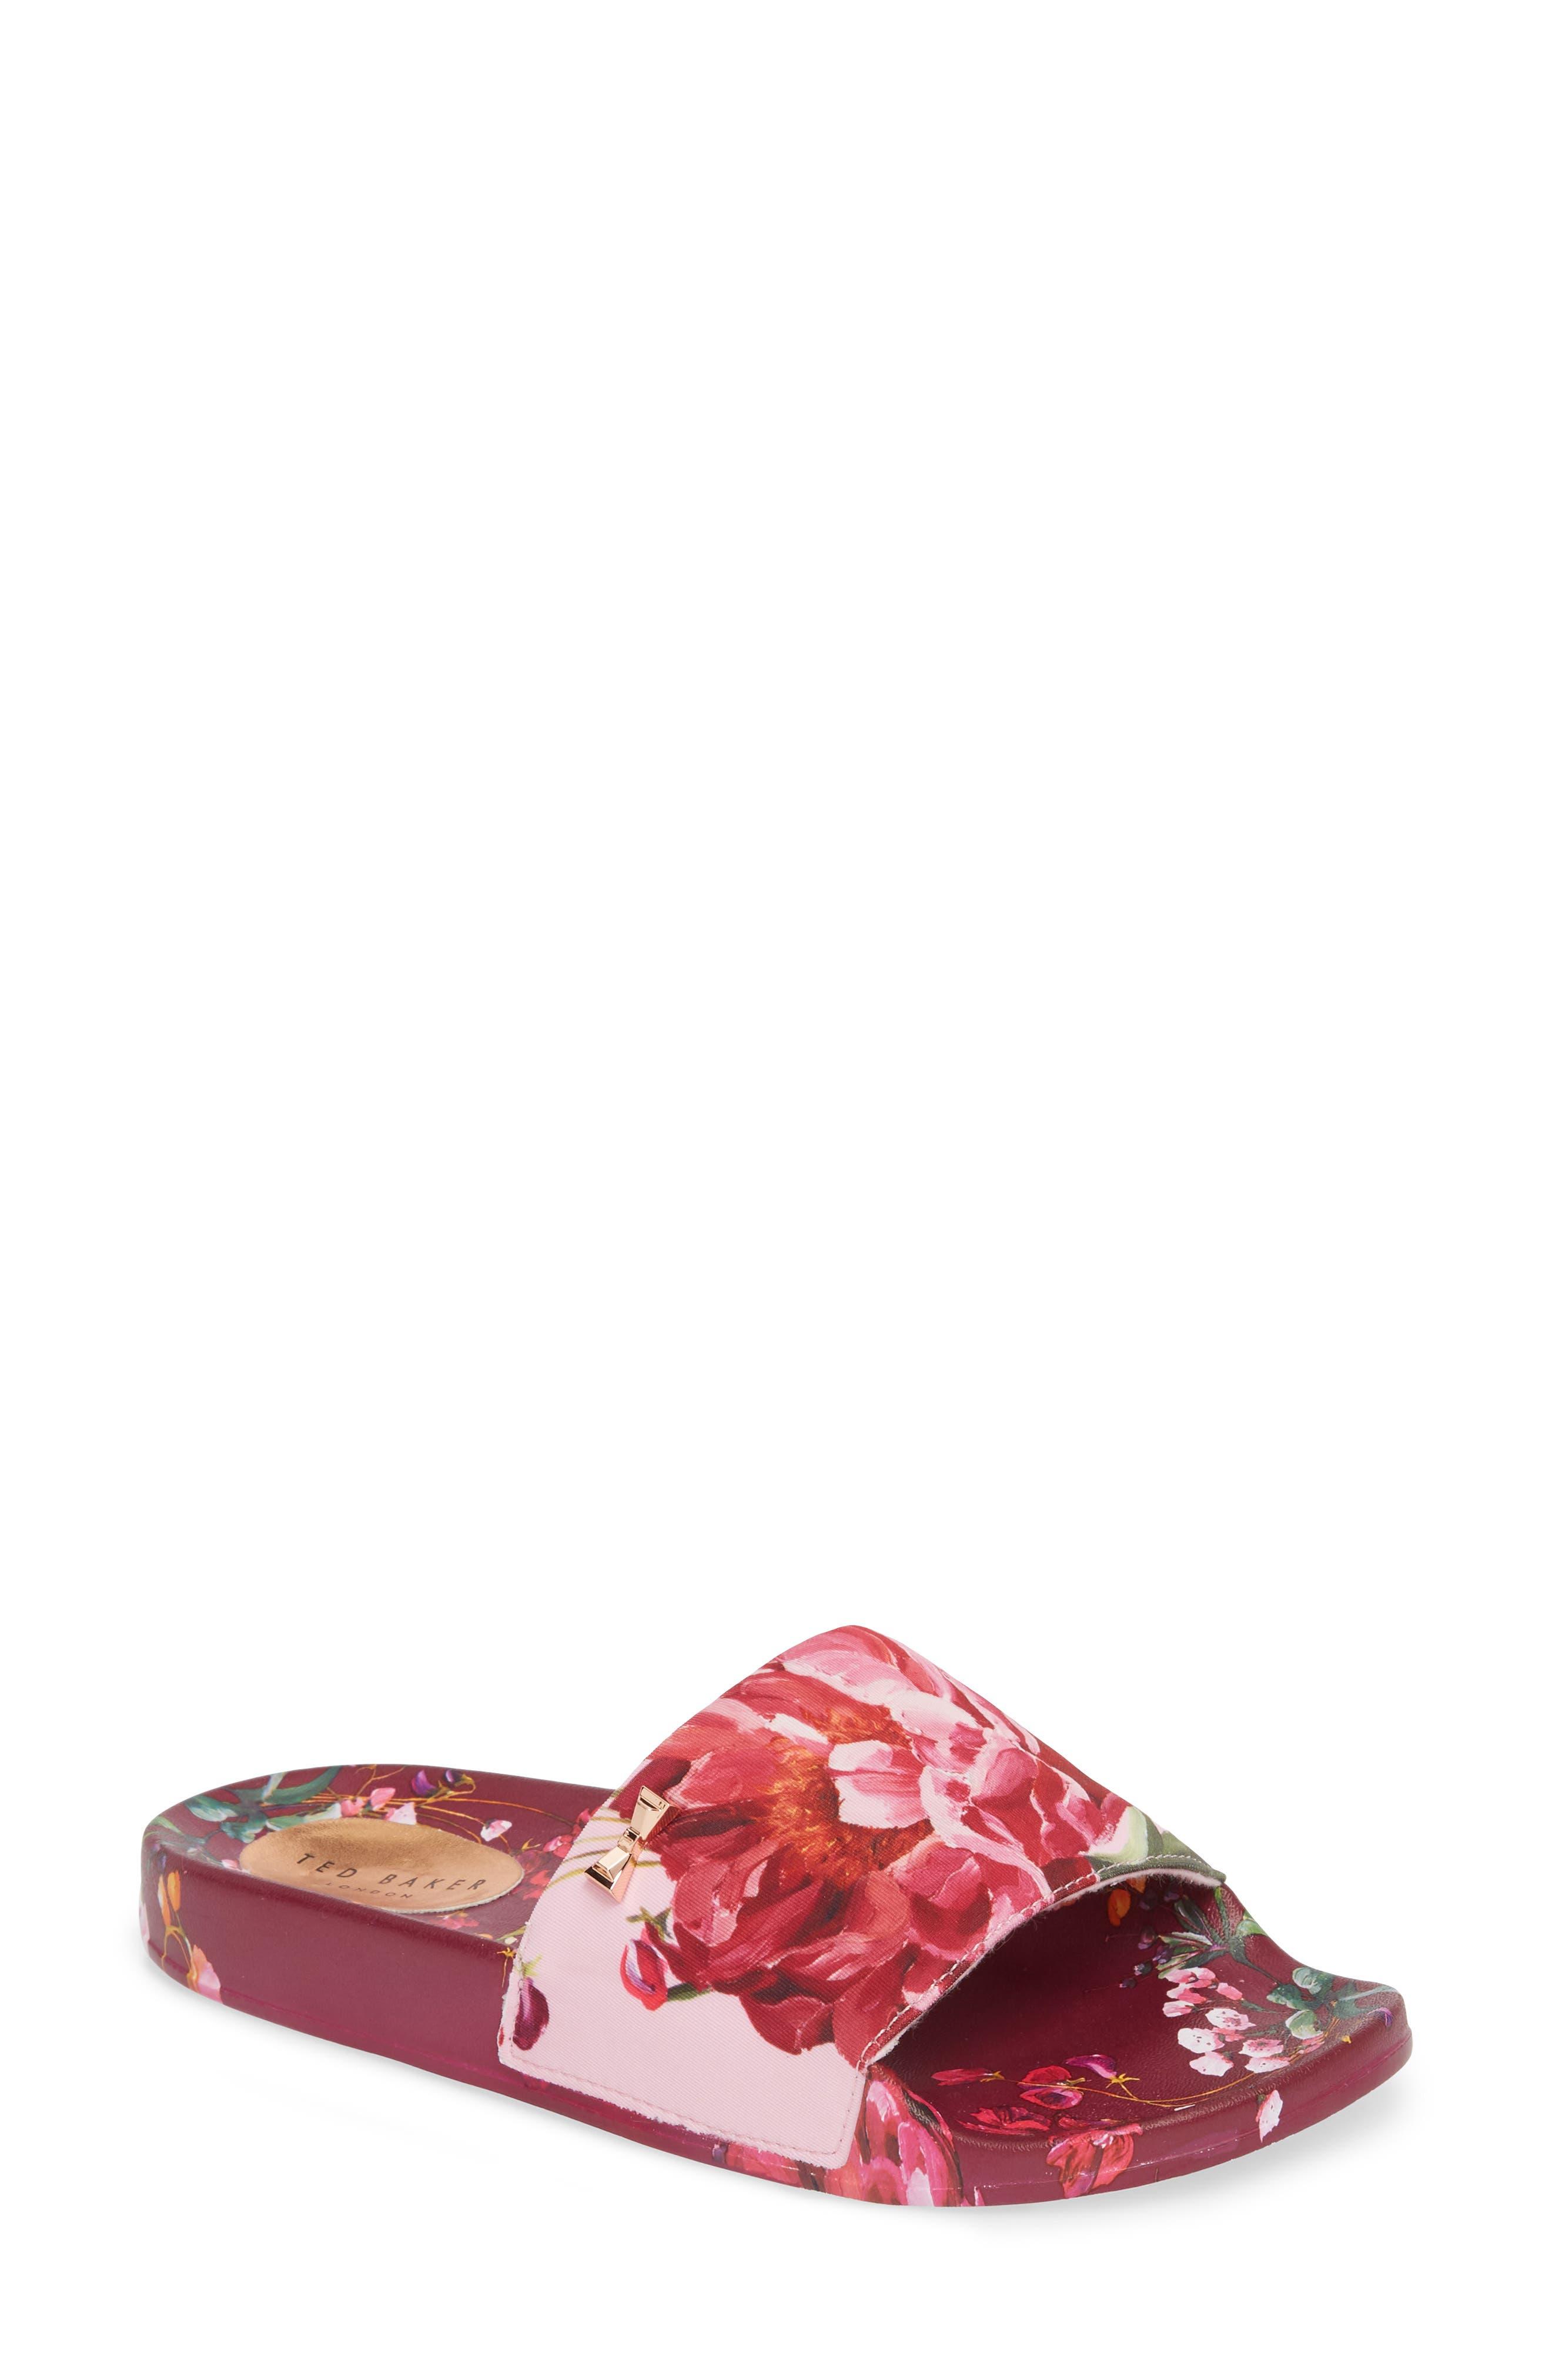 Qarla Slide Sandal,                         Main,                         color, 650